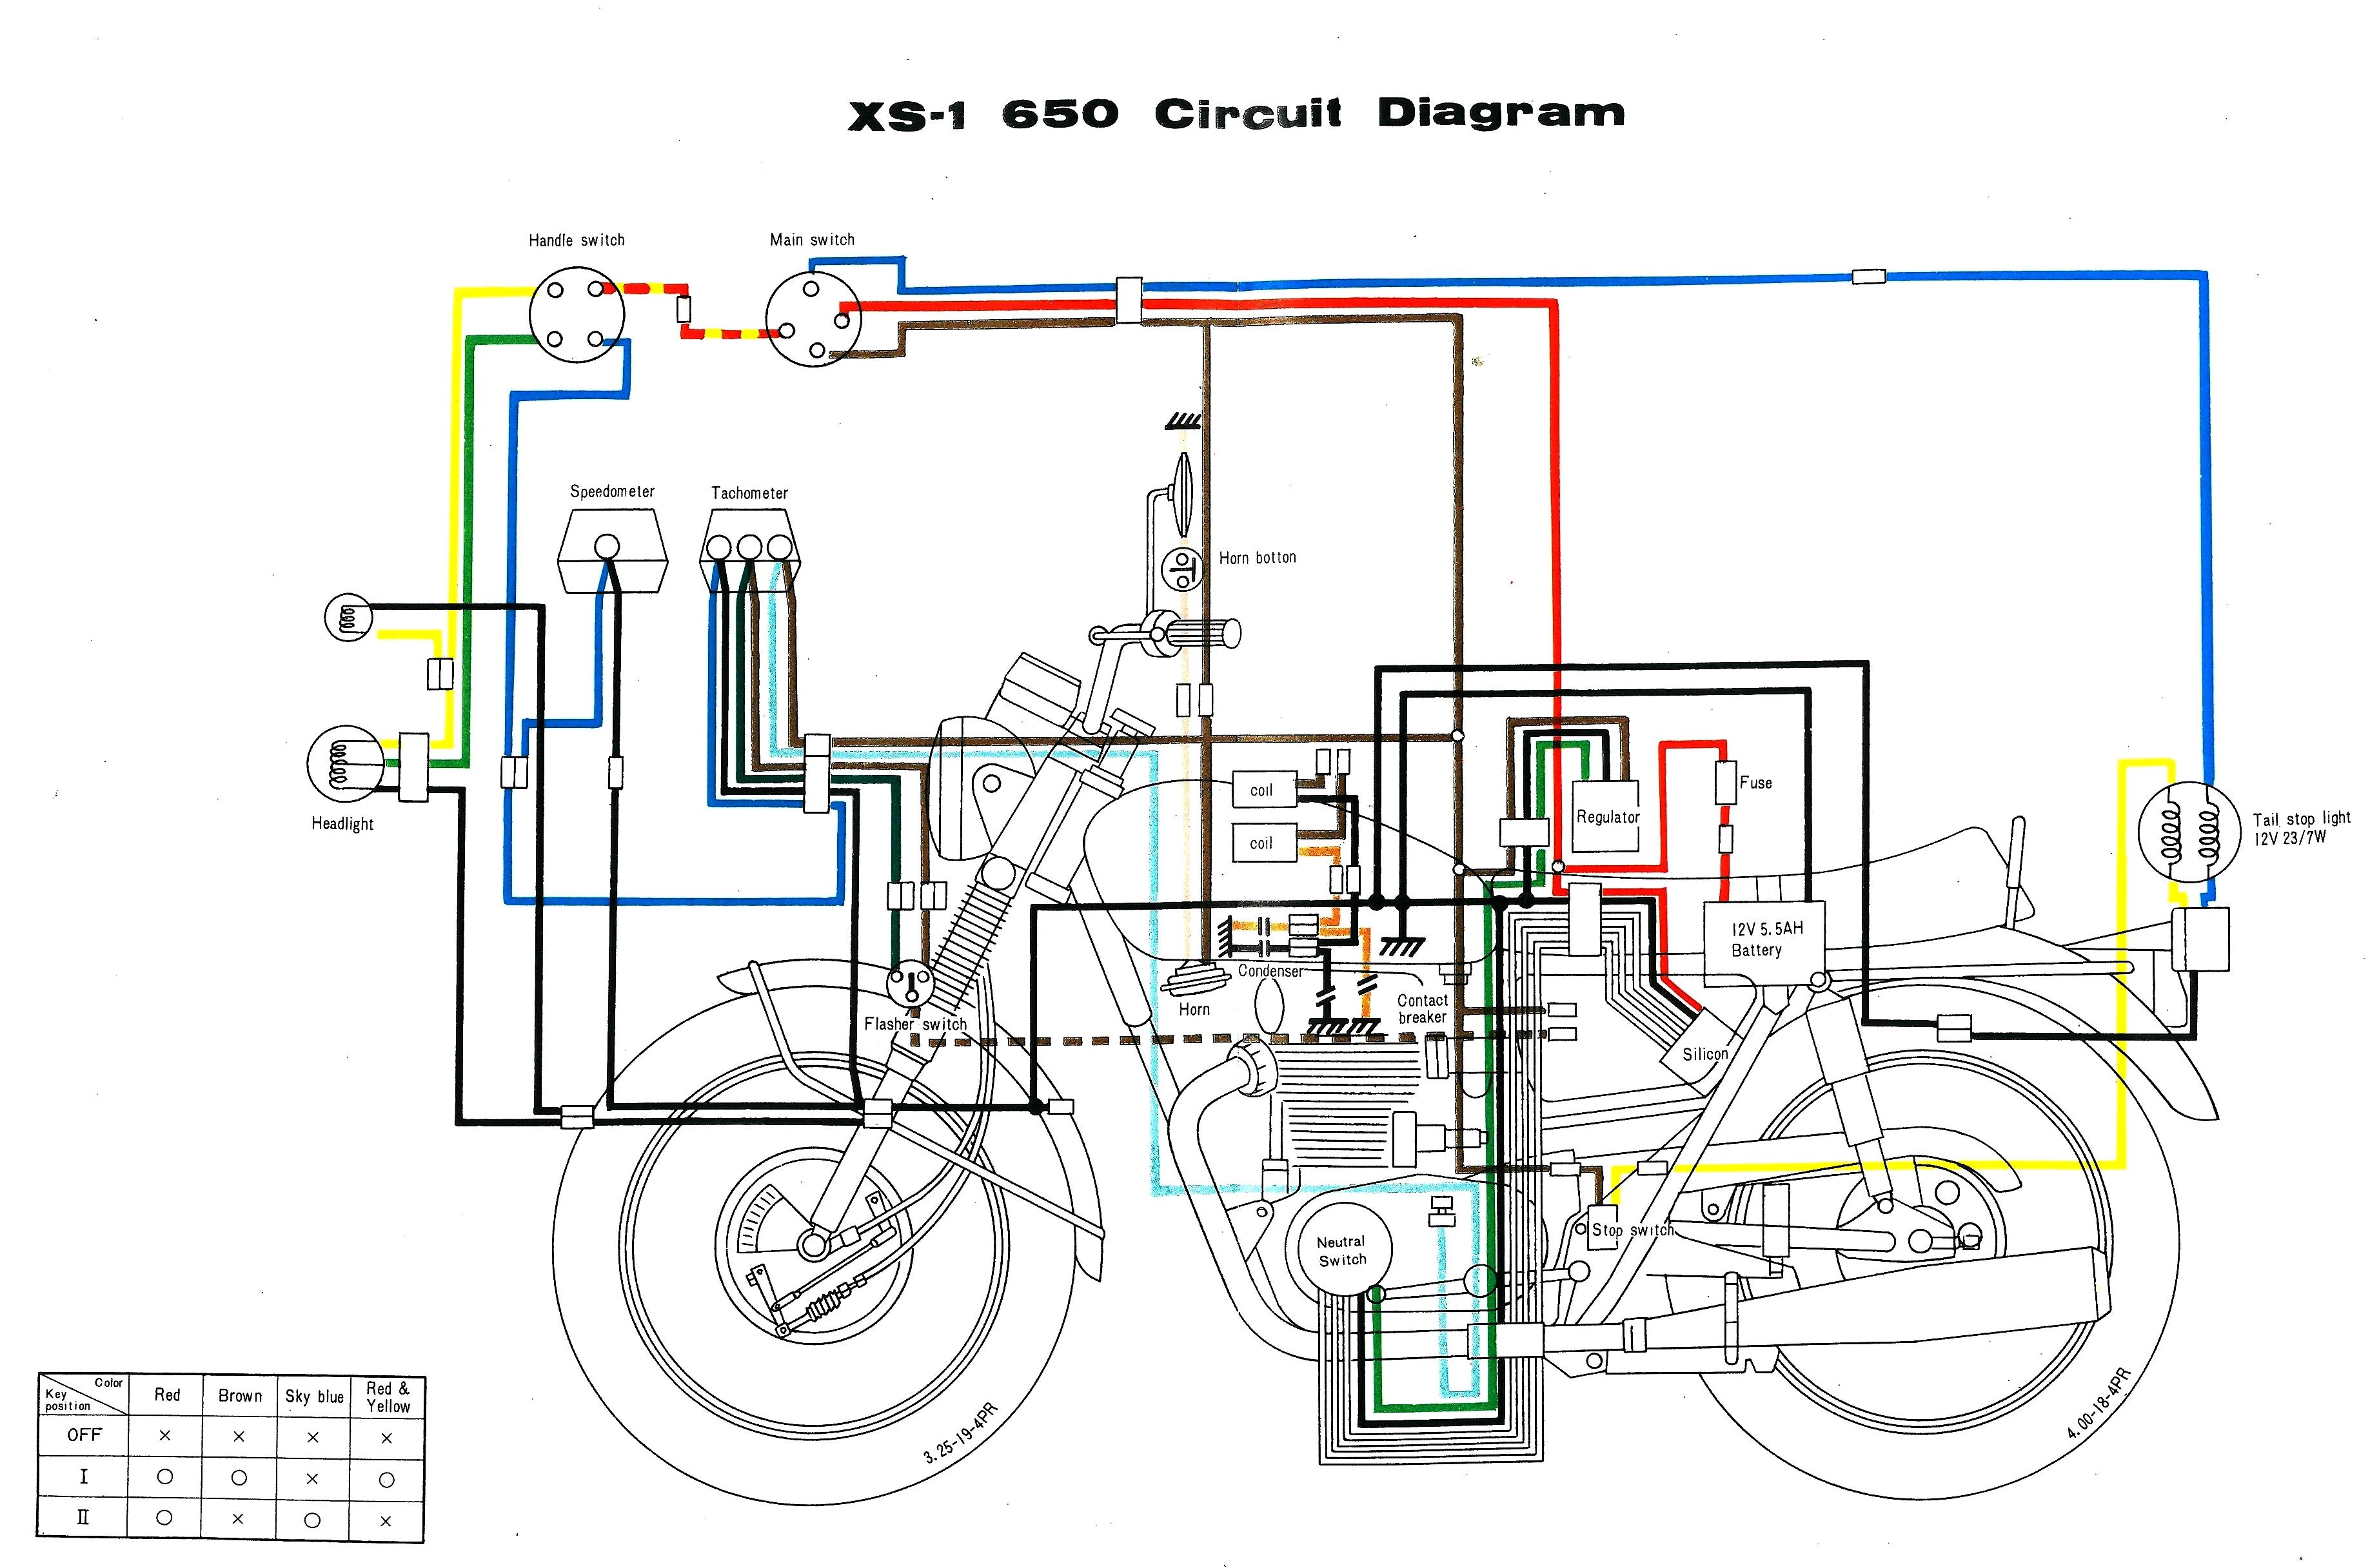 1977 Yamaha Xs 650 Wiring Diagram Electrical Schematics 12 Volt Triumph Schematic Xs650 Harness All Kind Of Diagrams U2022